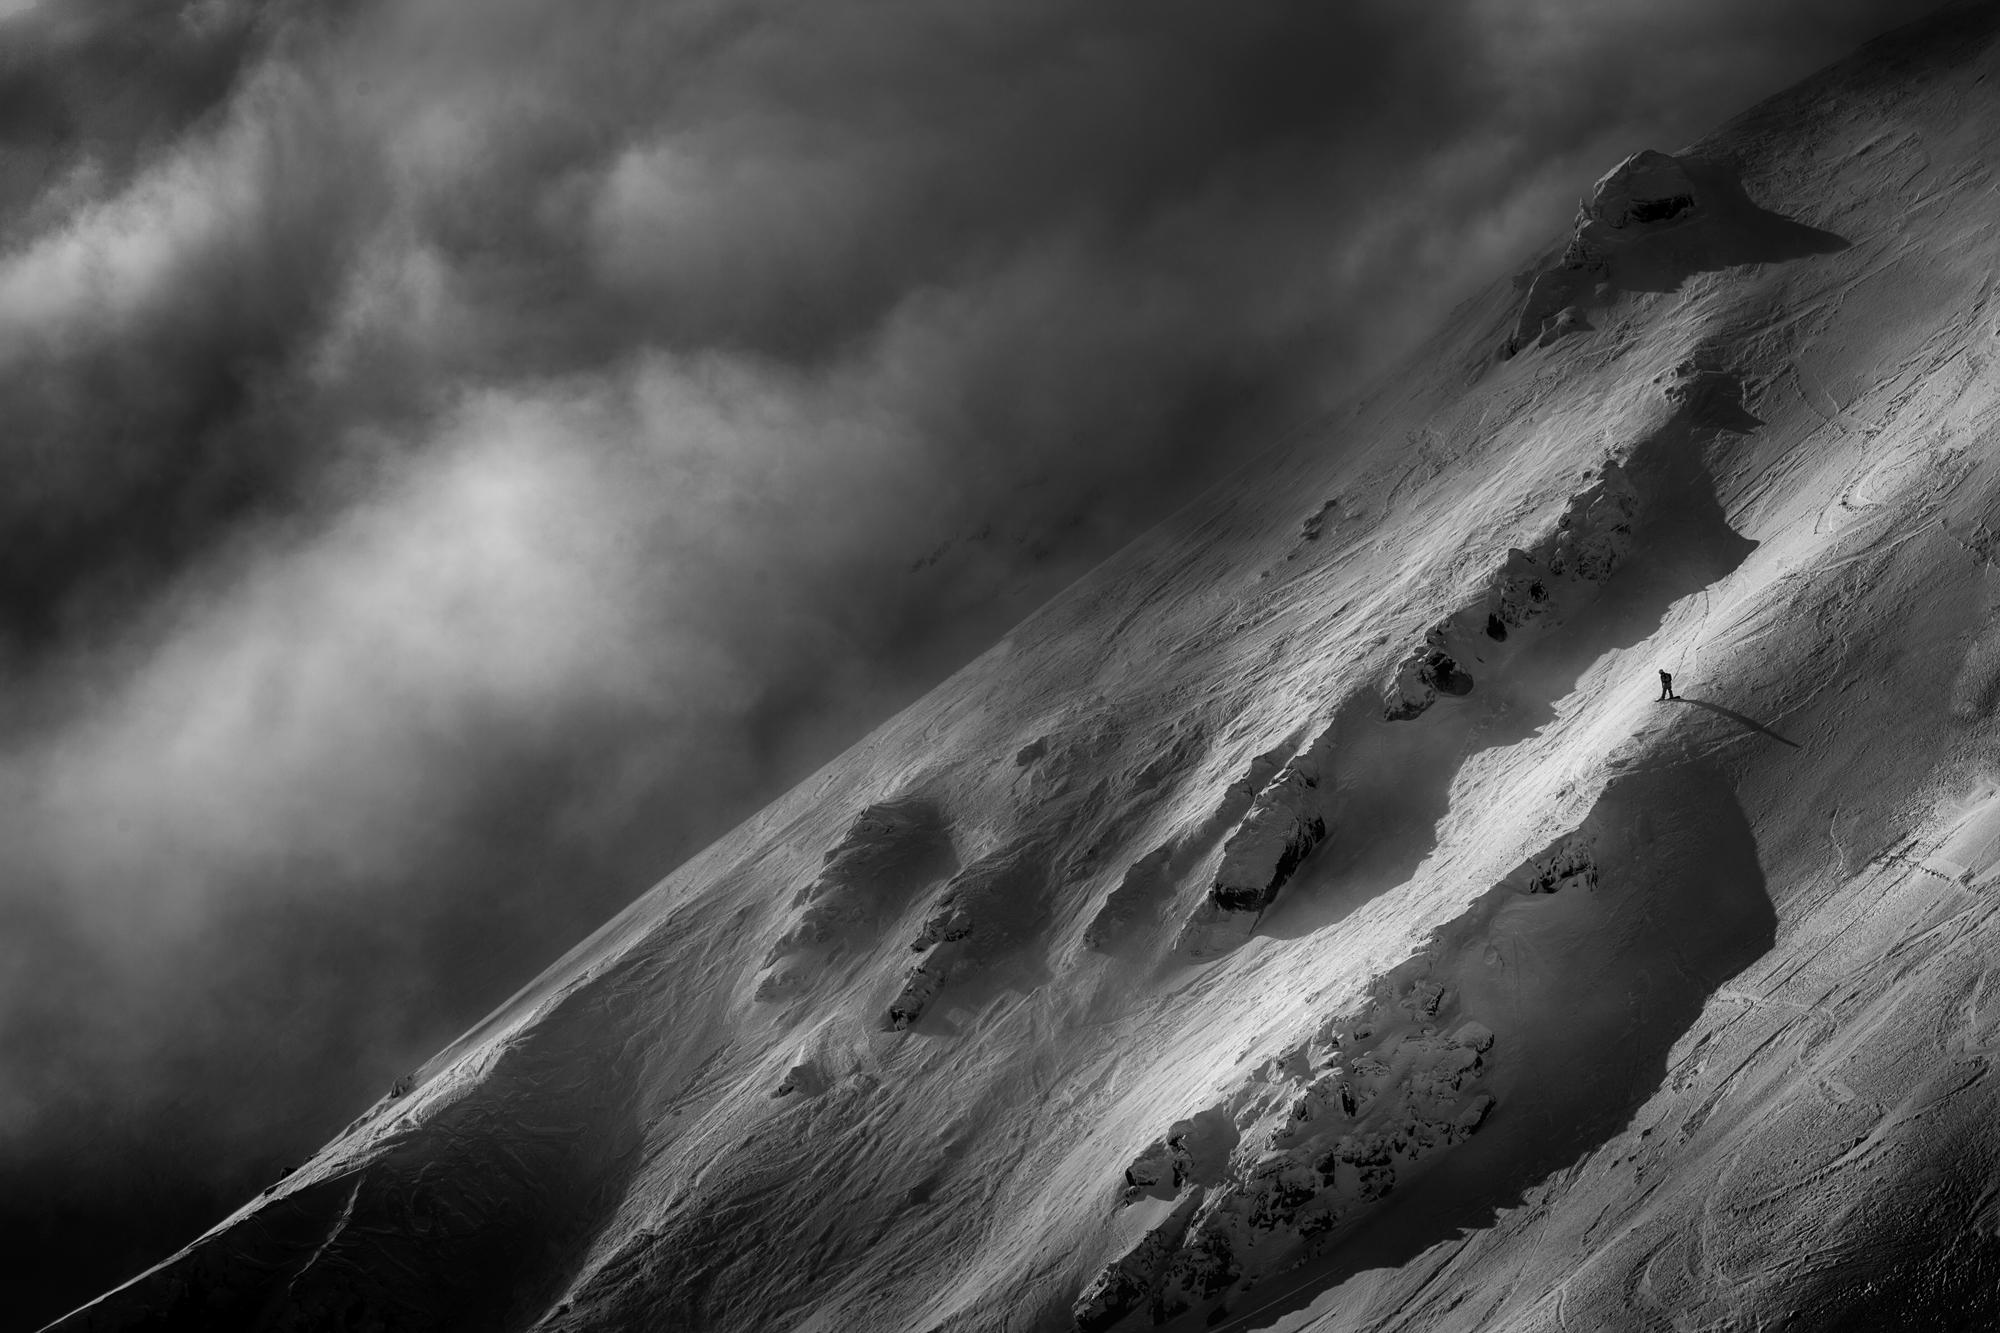 Alter-View_Photography_Showcase_Peter_Svoboda_3.jpeg